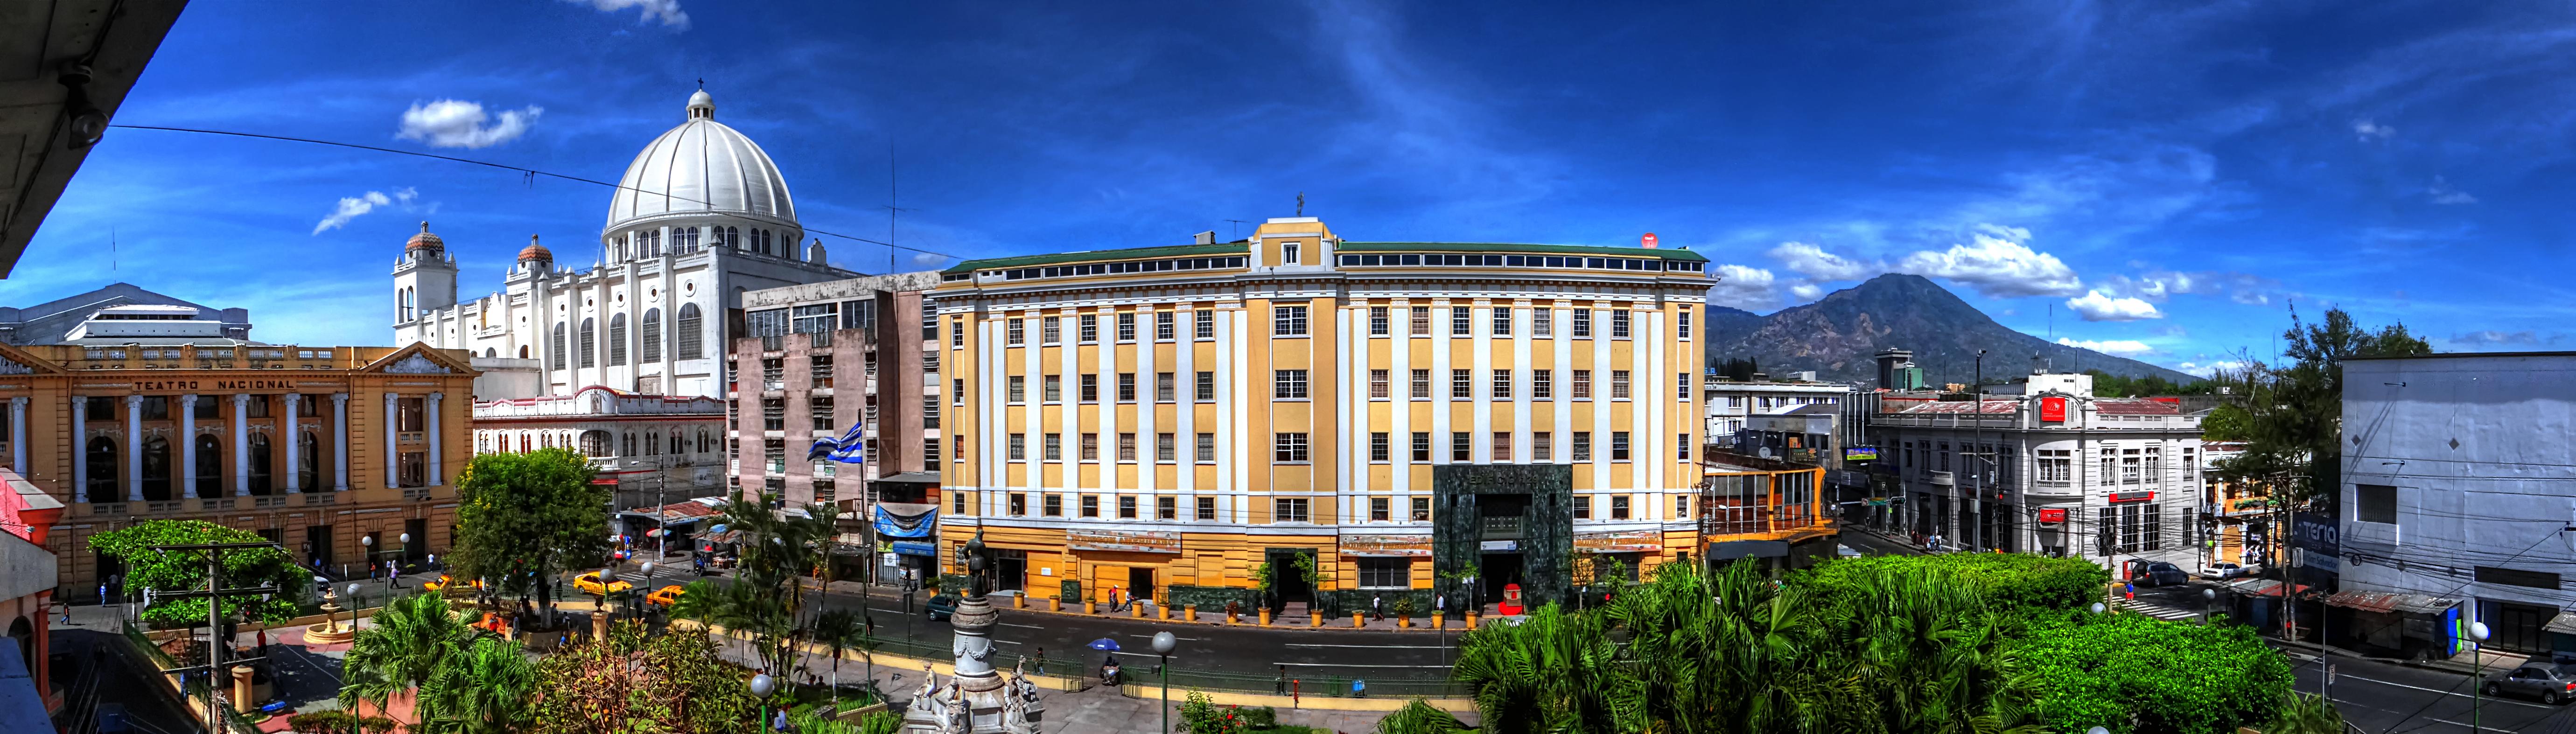 file panoramica del centro histórico de san salvador jpg wikimedia